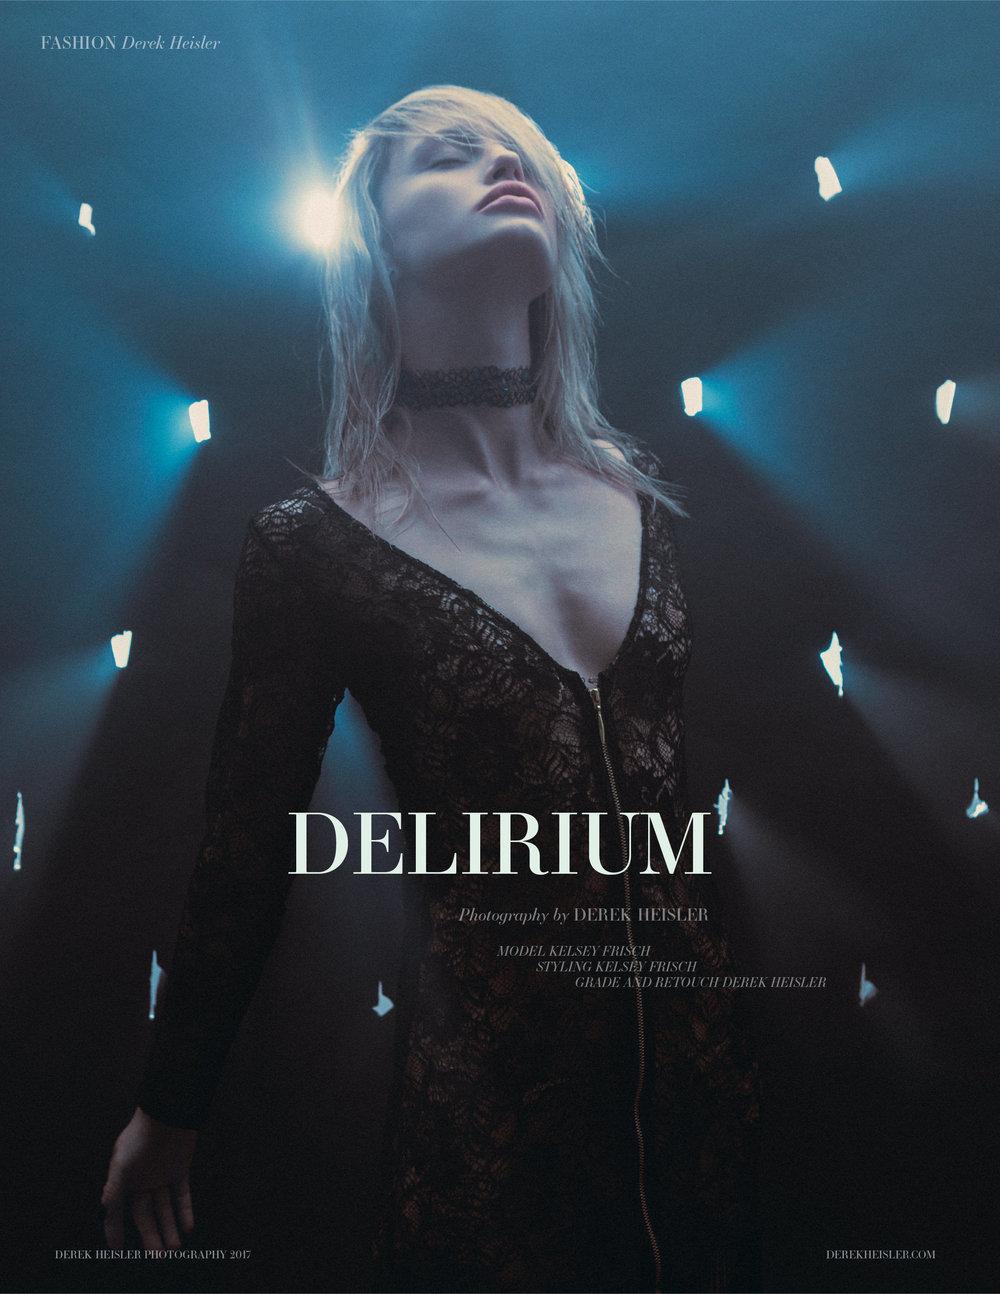 DHP-Delirium - Page 1 of 10.jpg